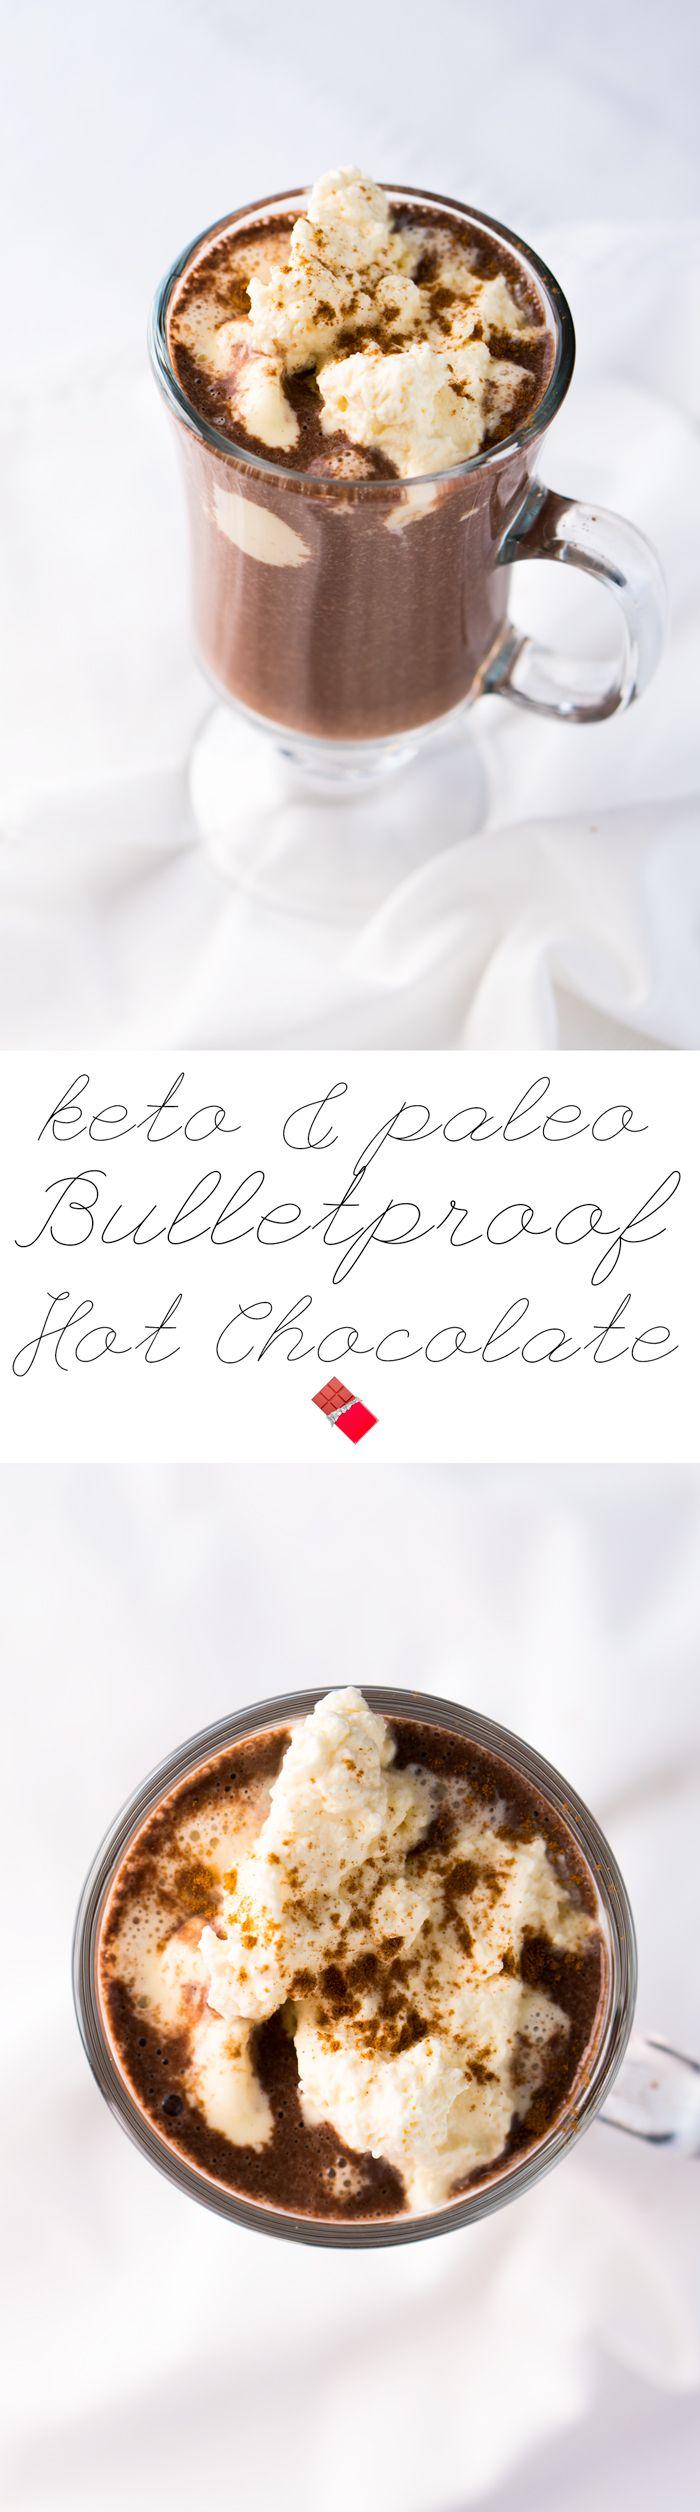 Suuuper Thick & Creamy Keto Bulletproof Hot Chocolate 2g net carbs #ketohotchocolate #bulletproof #lowcarbchocolate